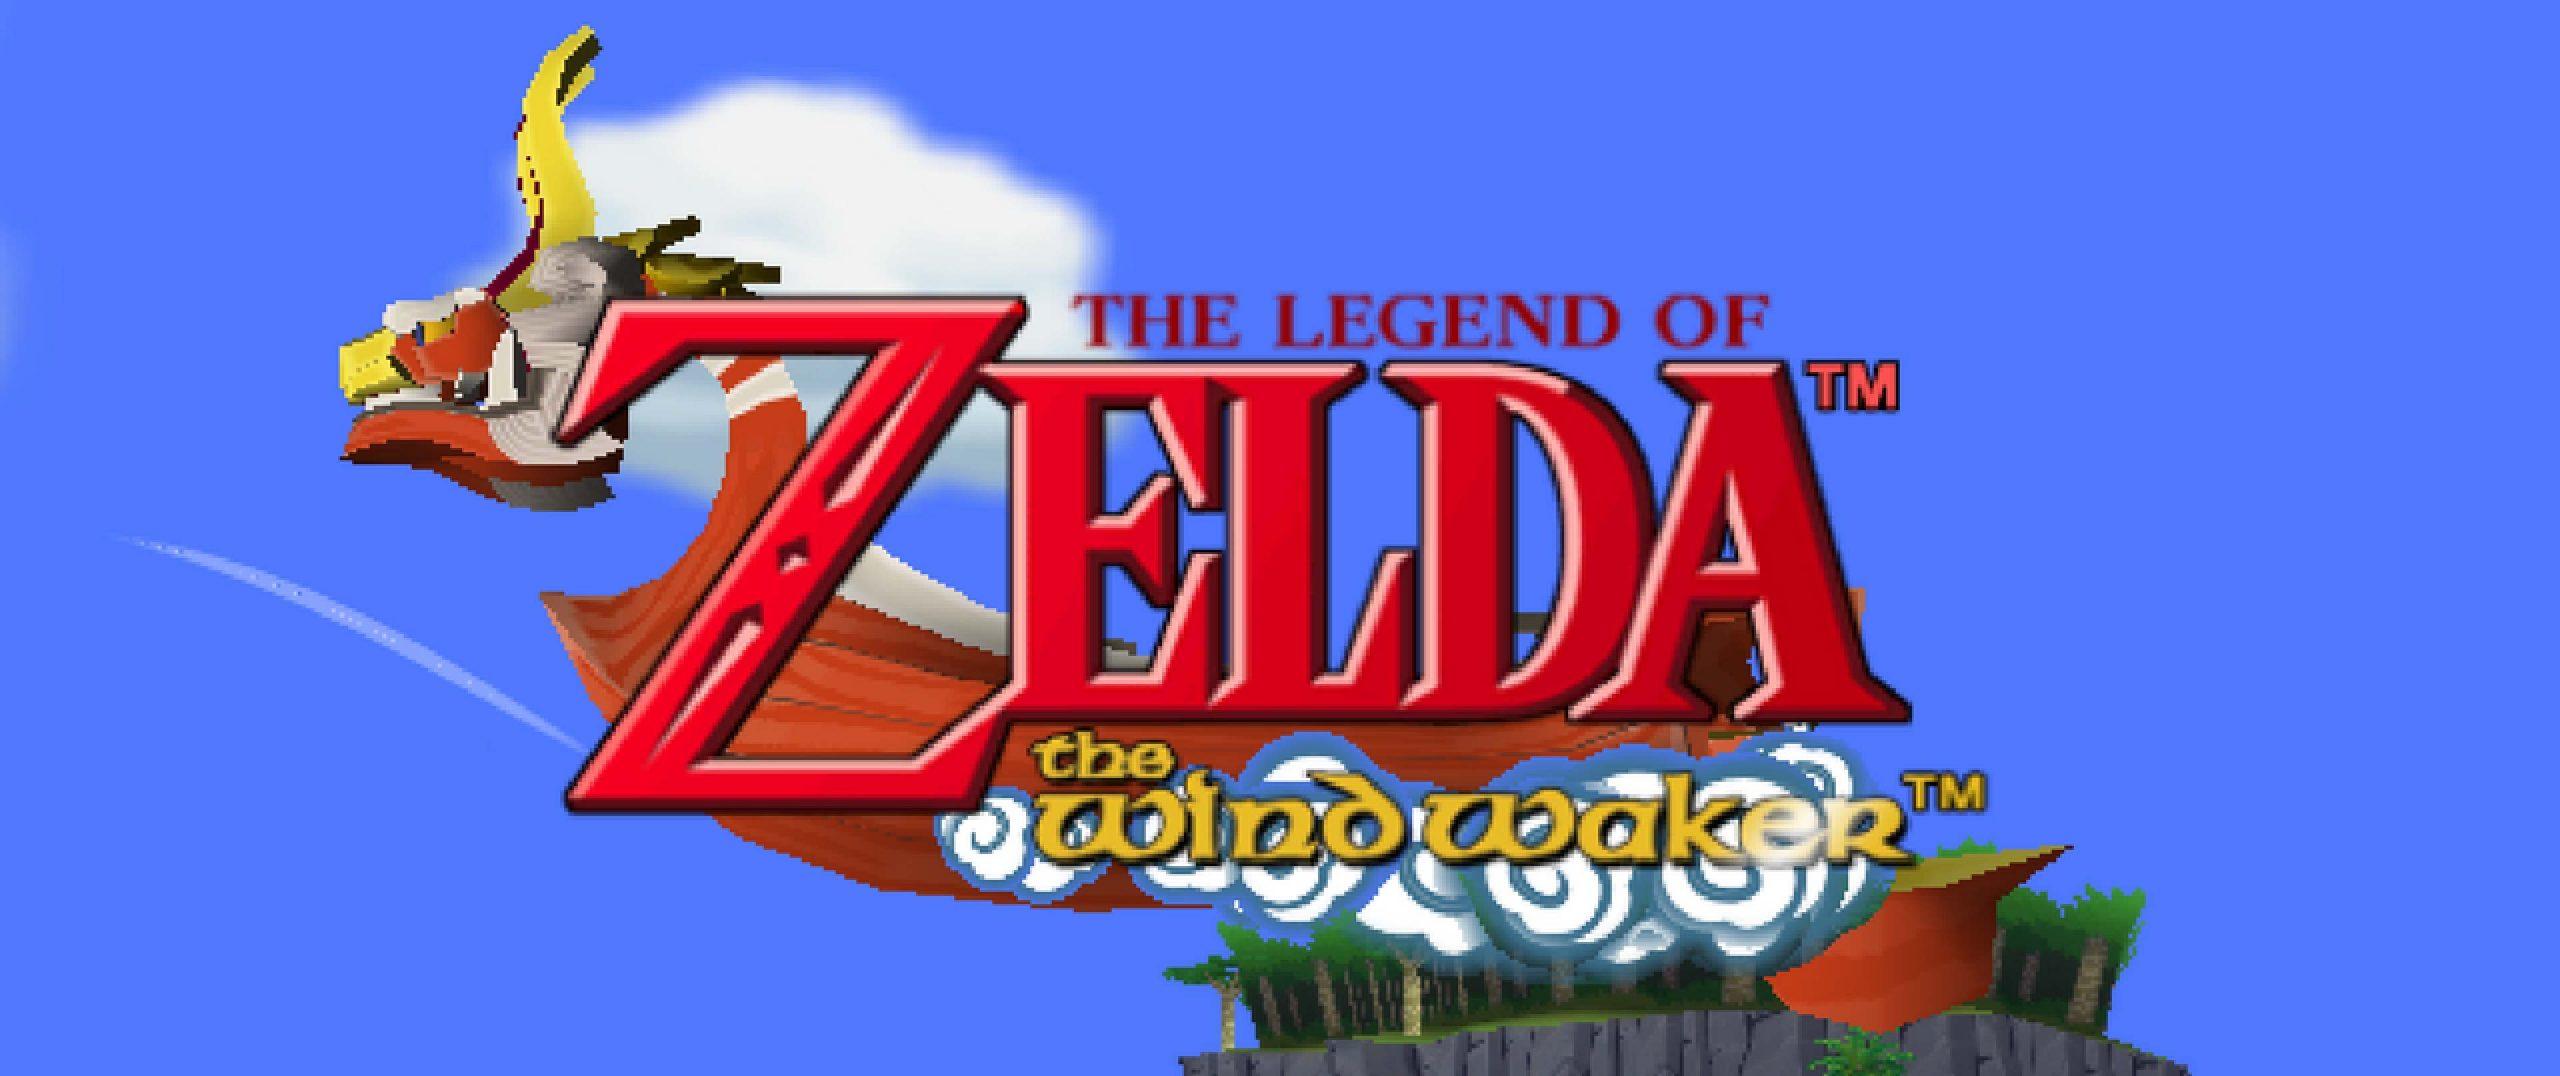 The Legend of Zelda - The Wind Waker - Title screen